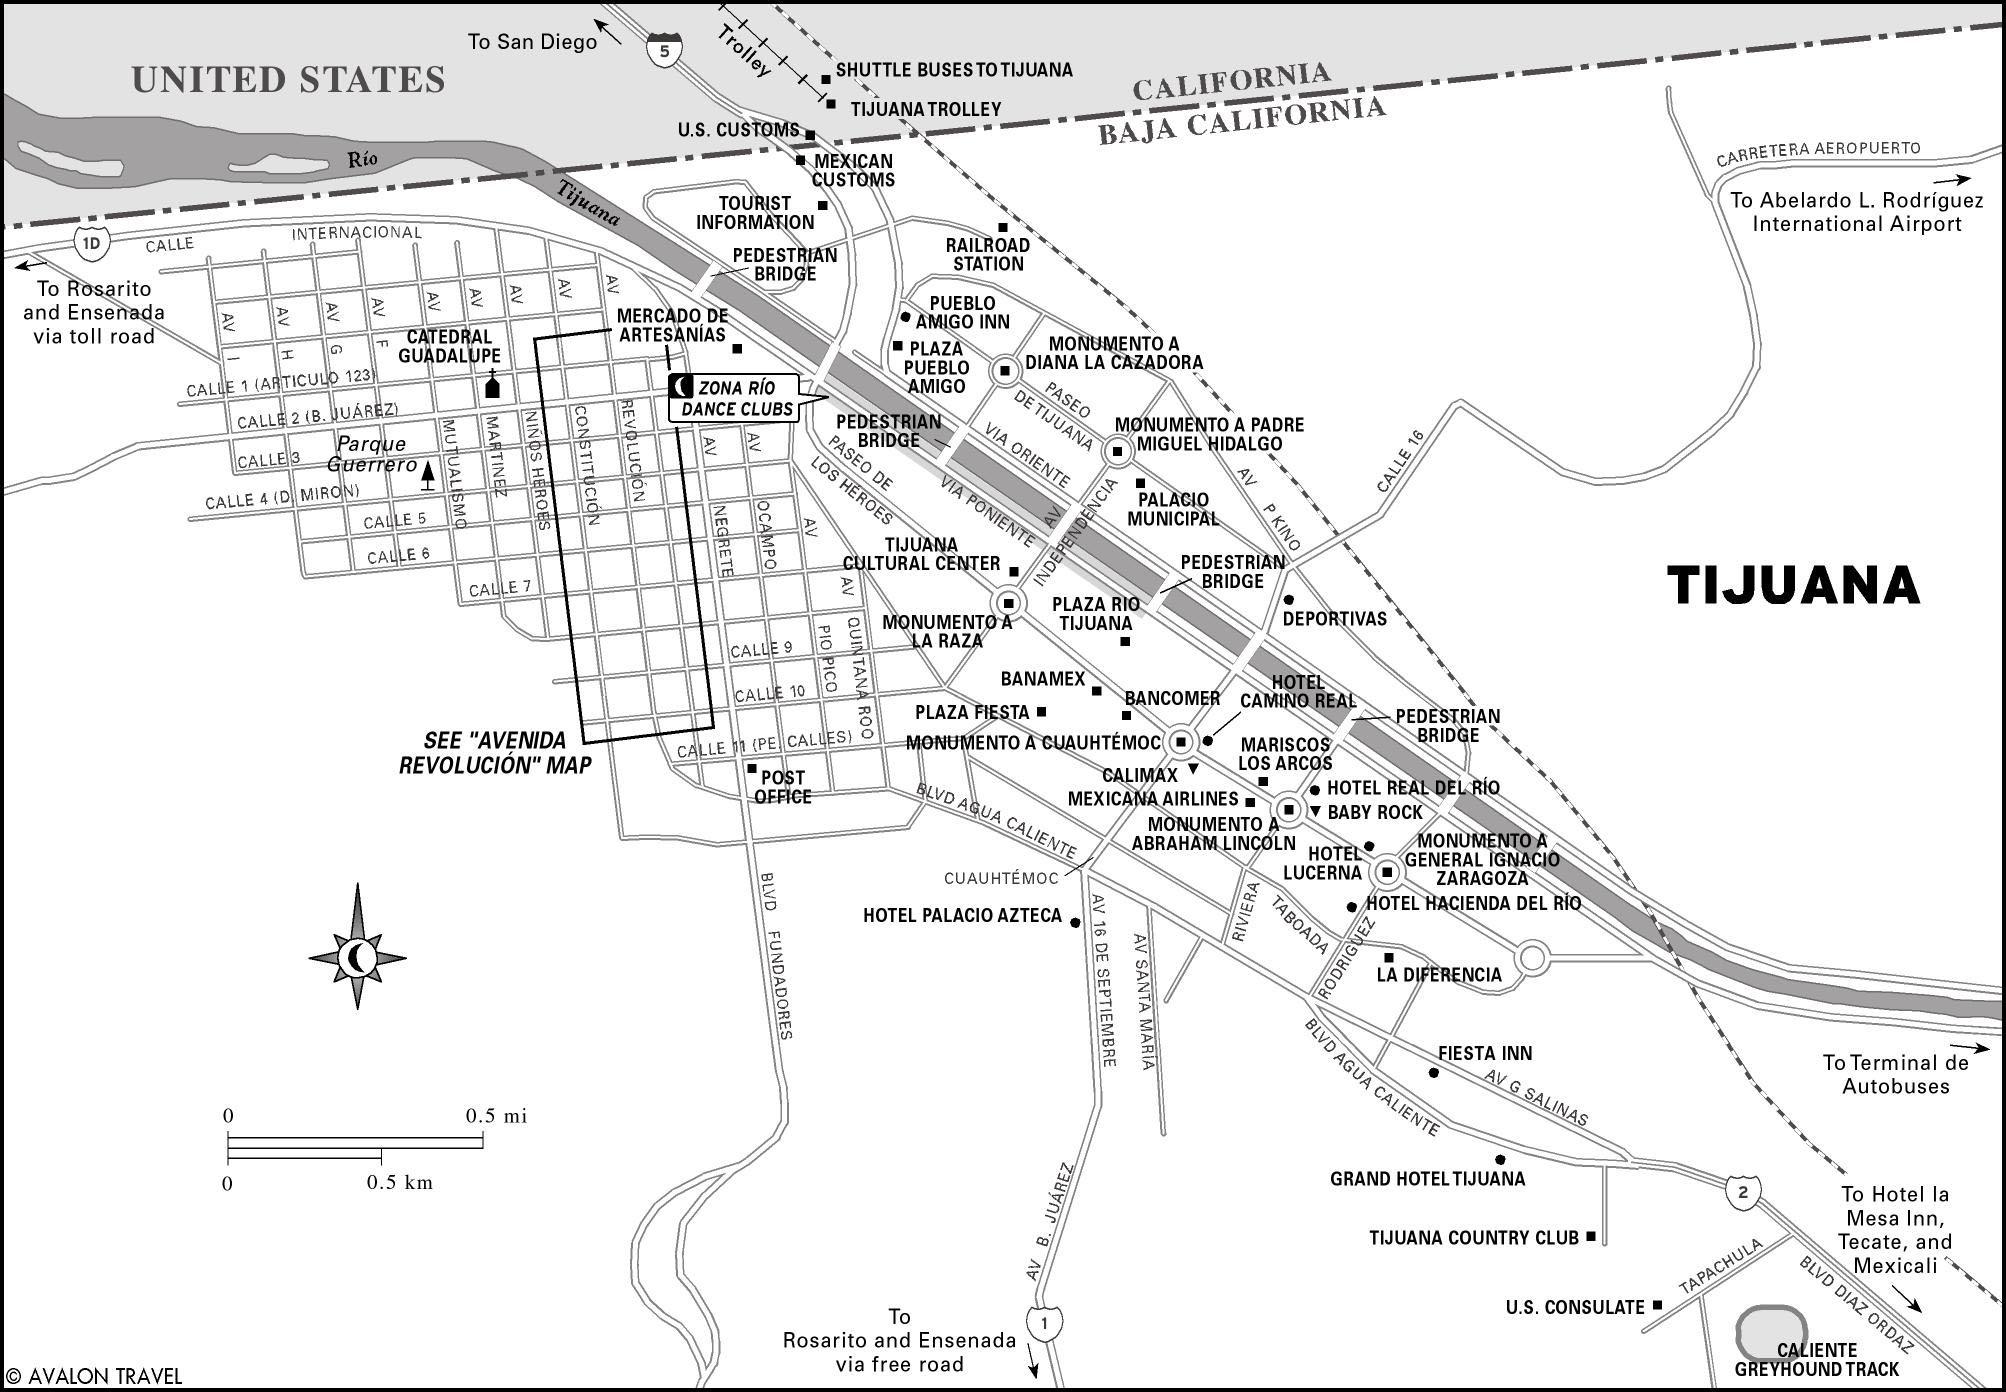 Printable Travel Maps Of Baja Moon Travel Guides - Google maps us border to rosarito mexico